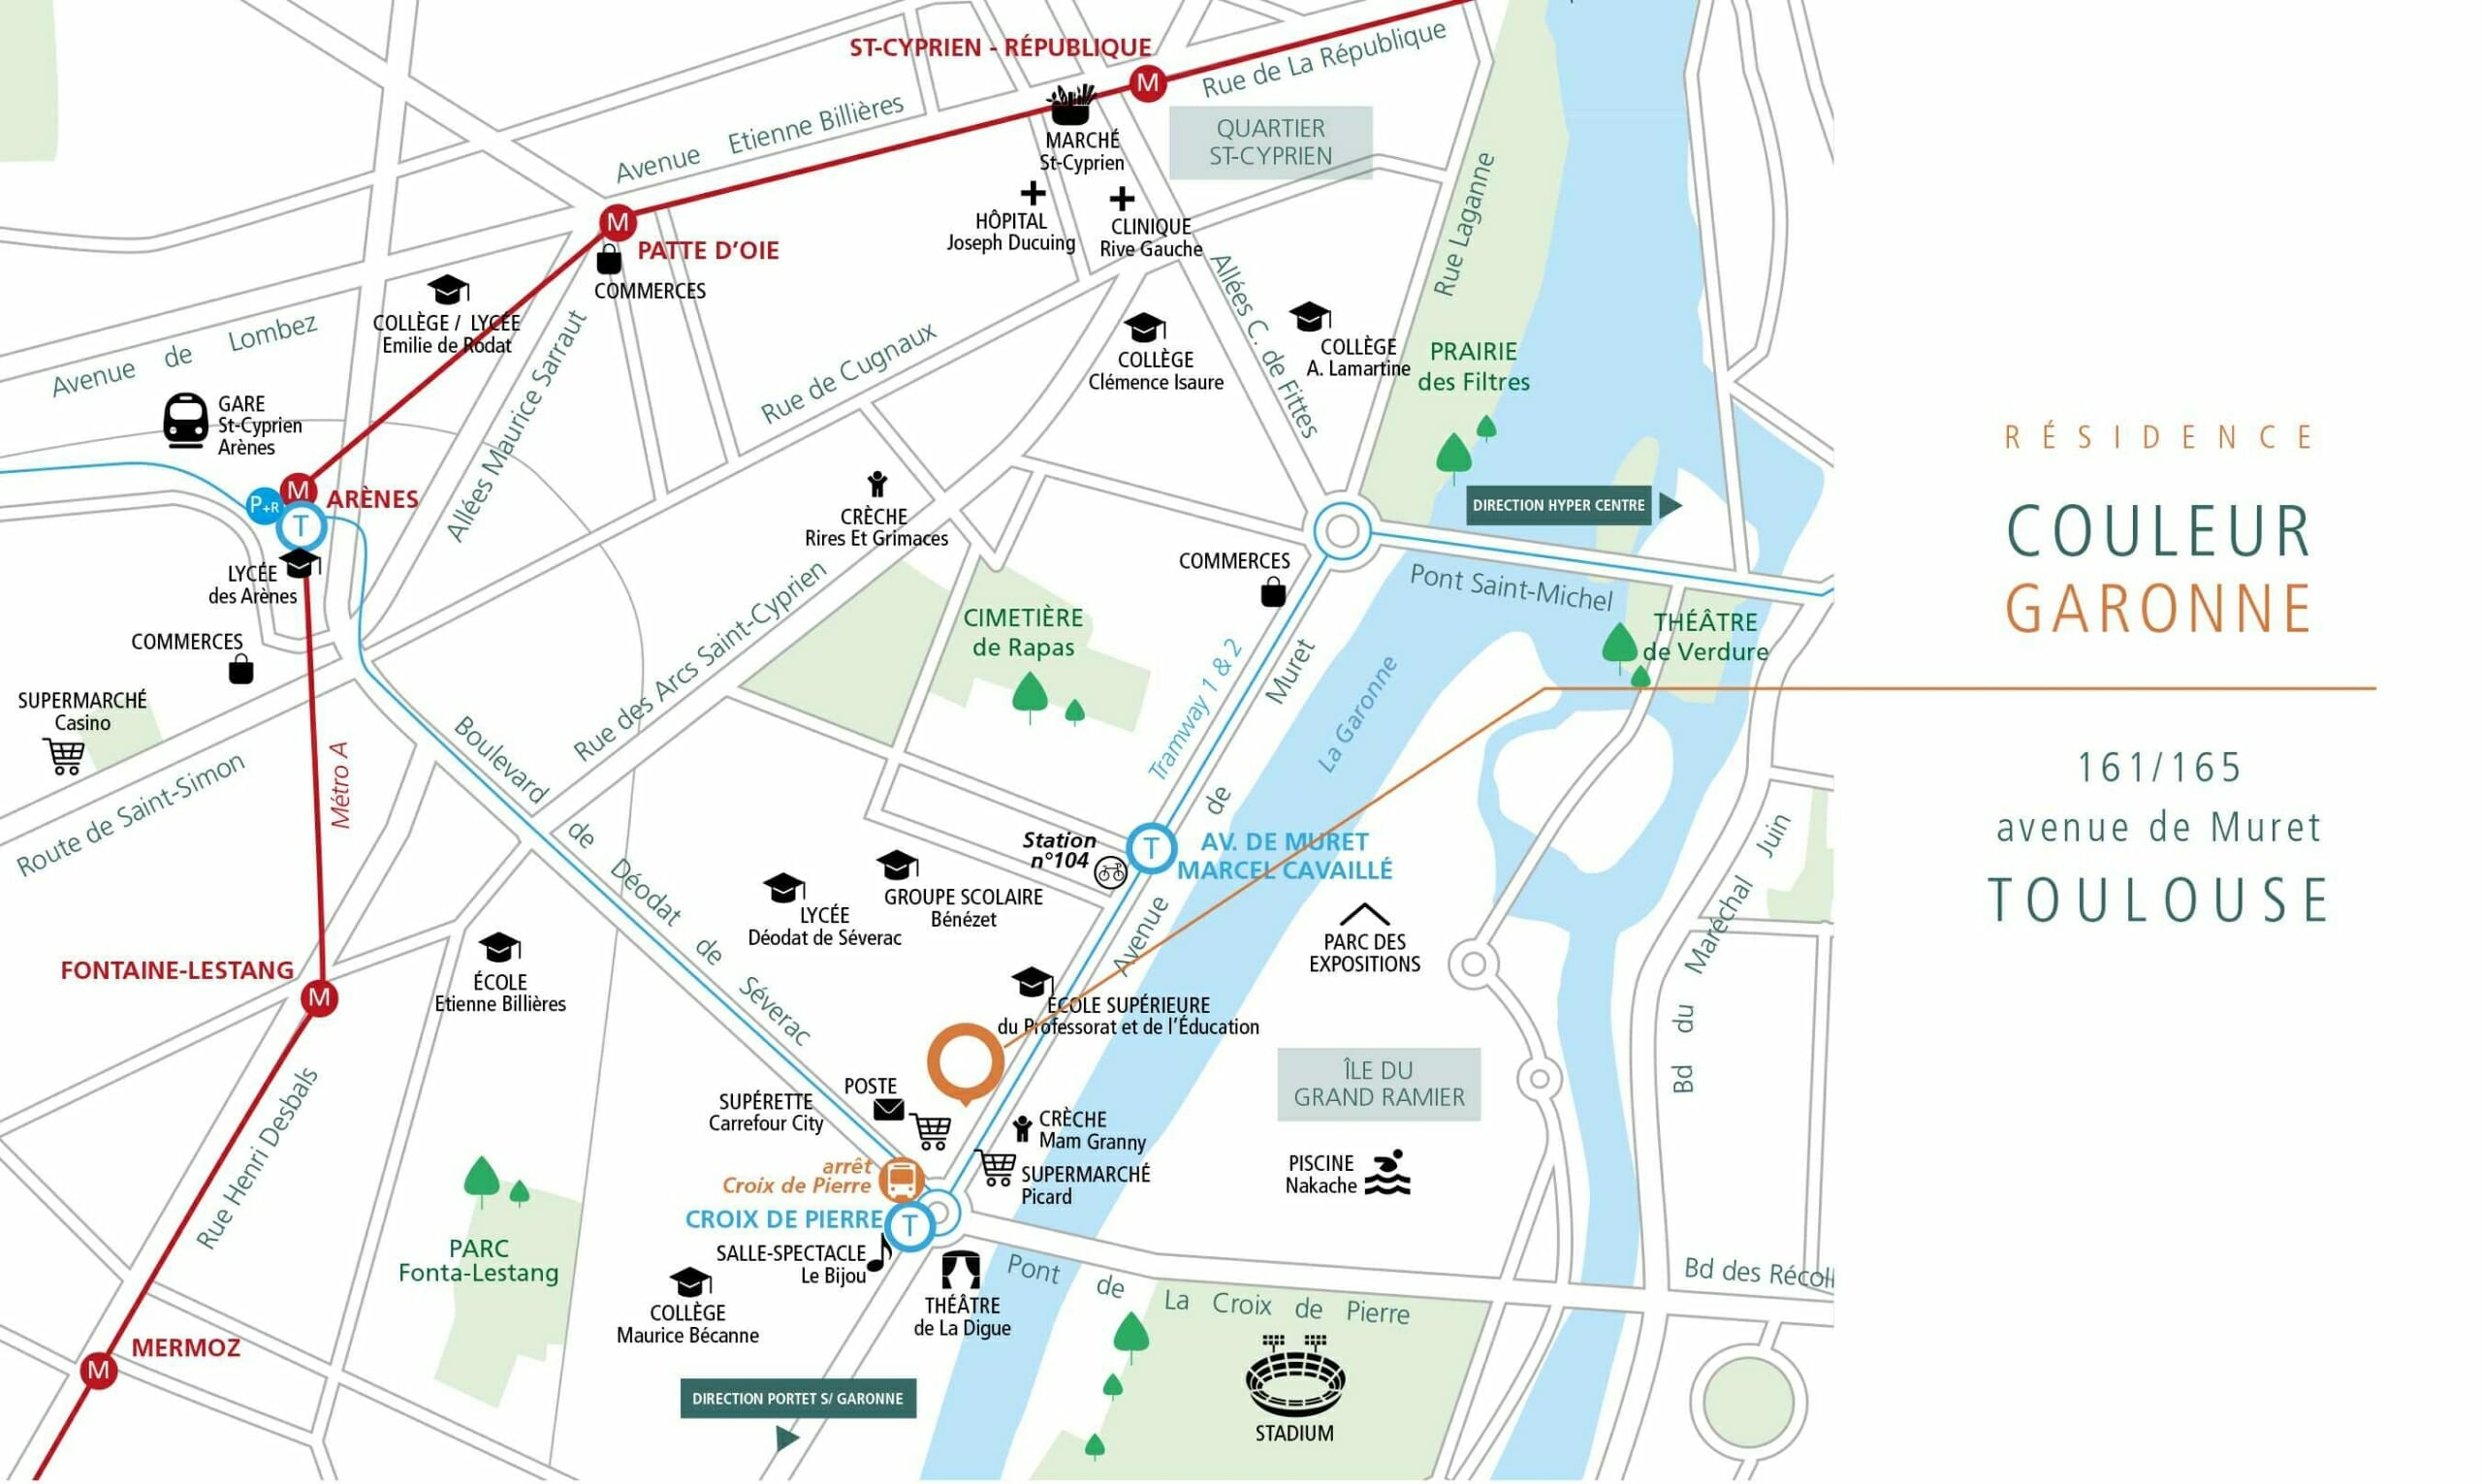 Urbanhouse360-PromoMidi-COuleur-Garonne-av-muret-plan-de-situation